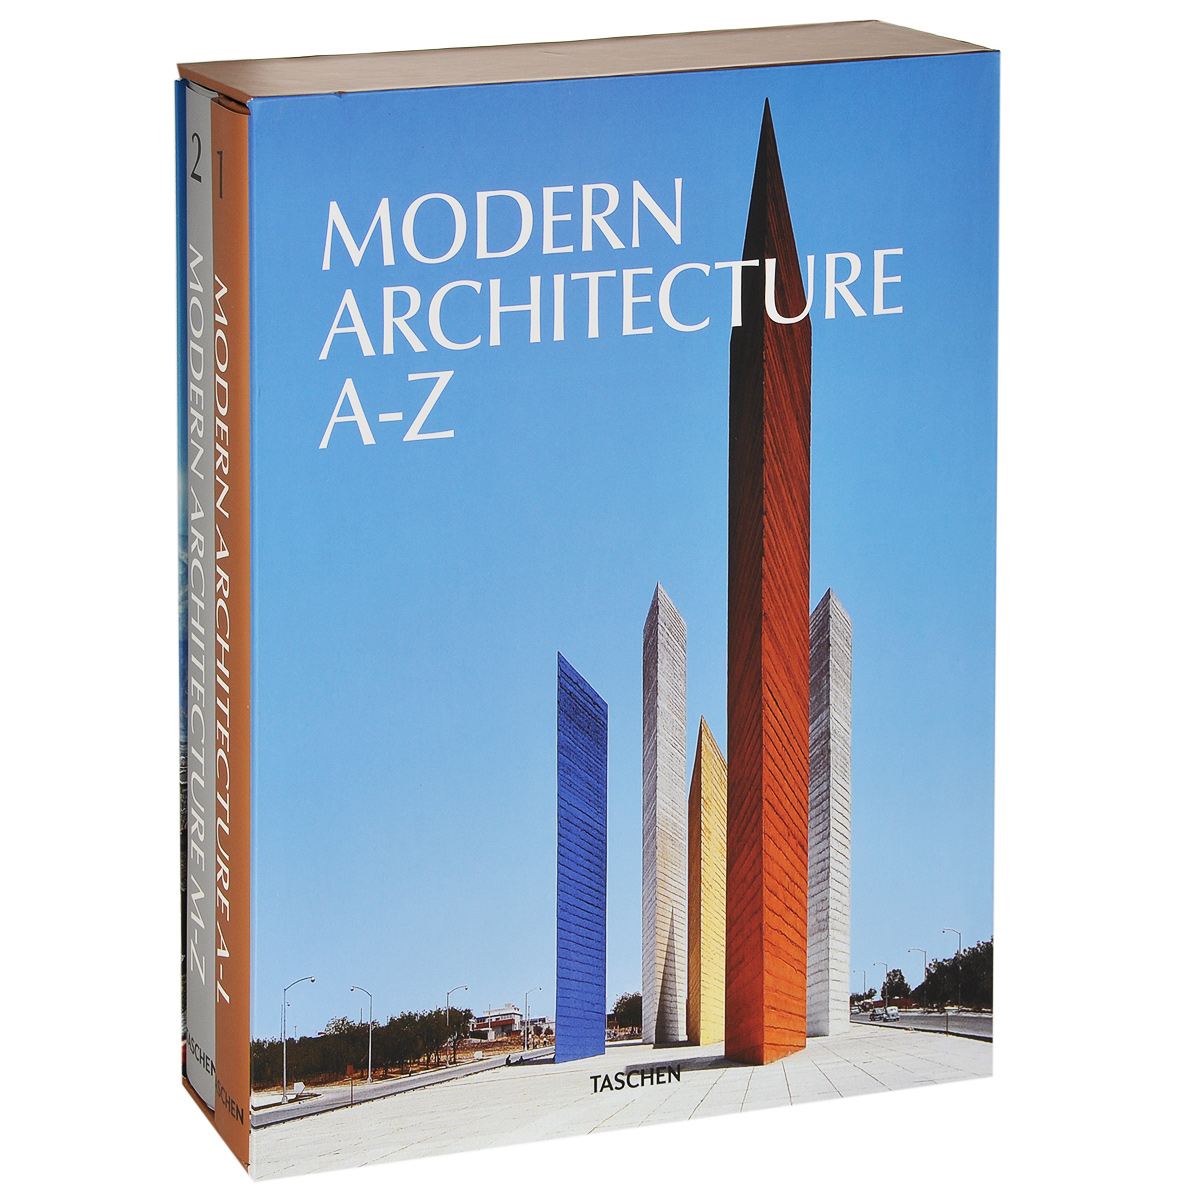 Modern Architecture A-Z (комплект из 2 книг)